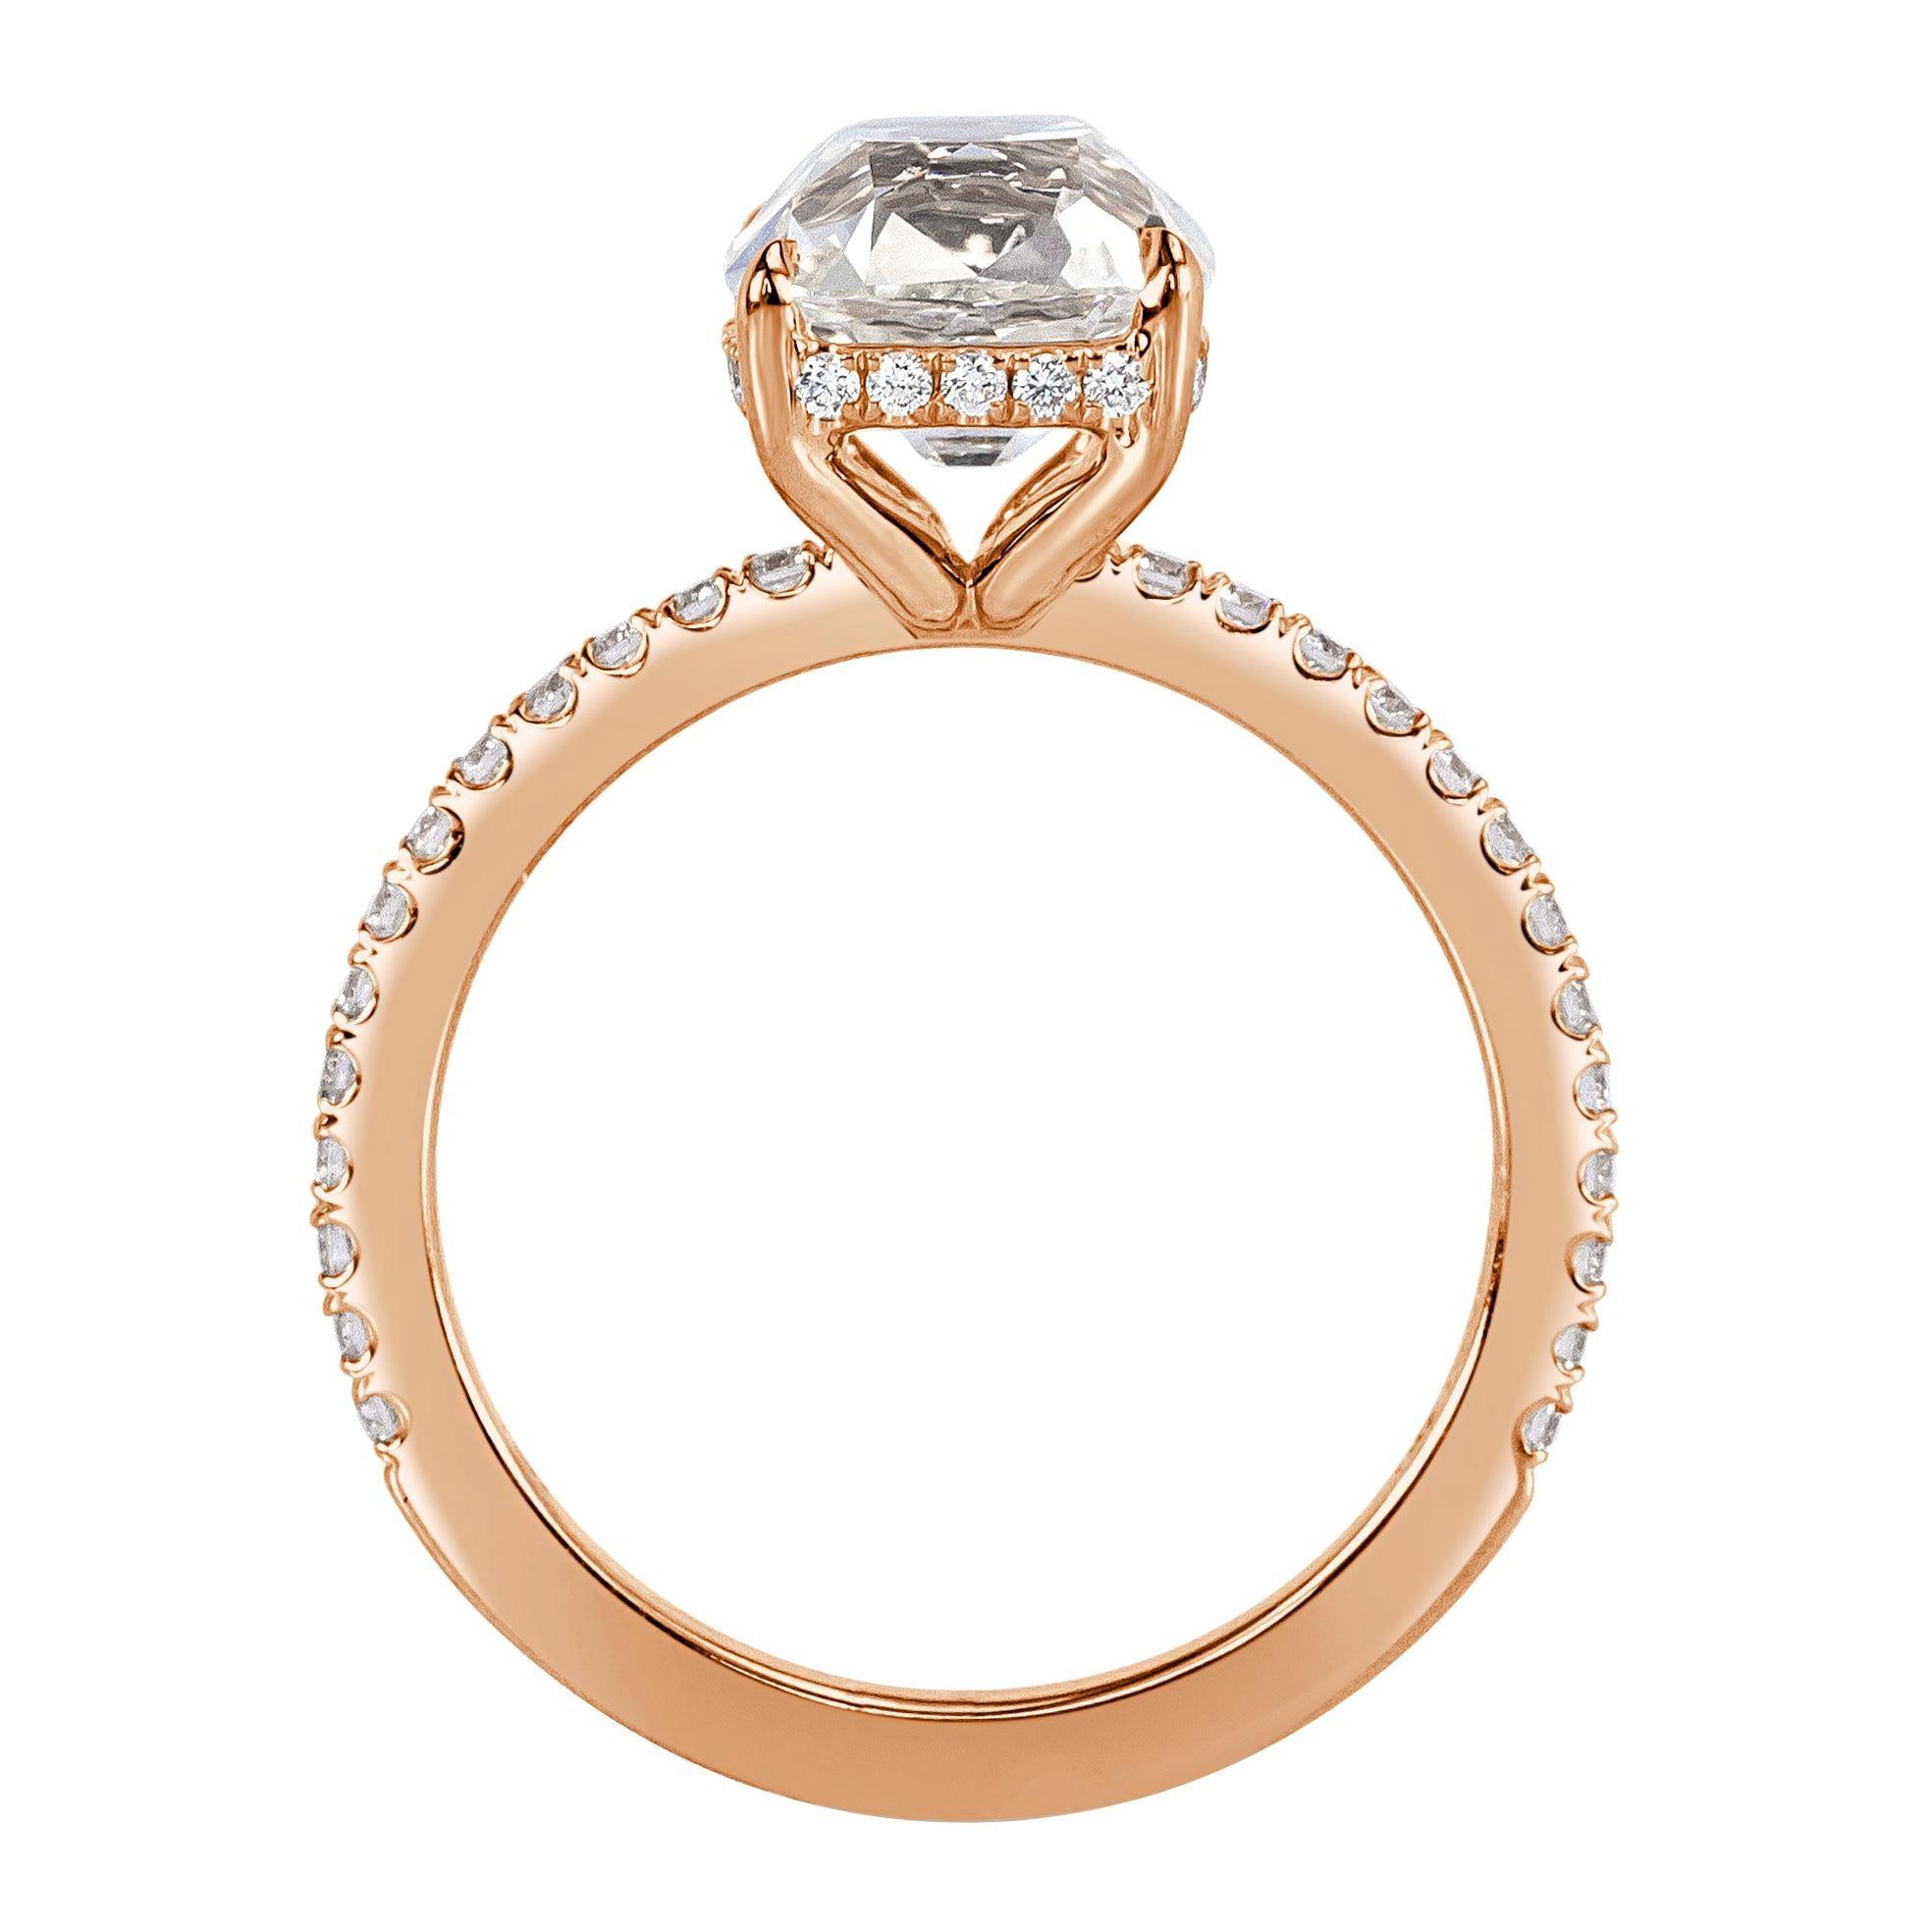 Mark Broumand 2.47 Carat Old Mine Cut Diamond Engagement Ring